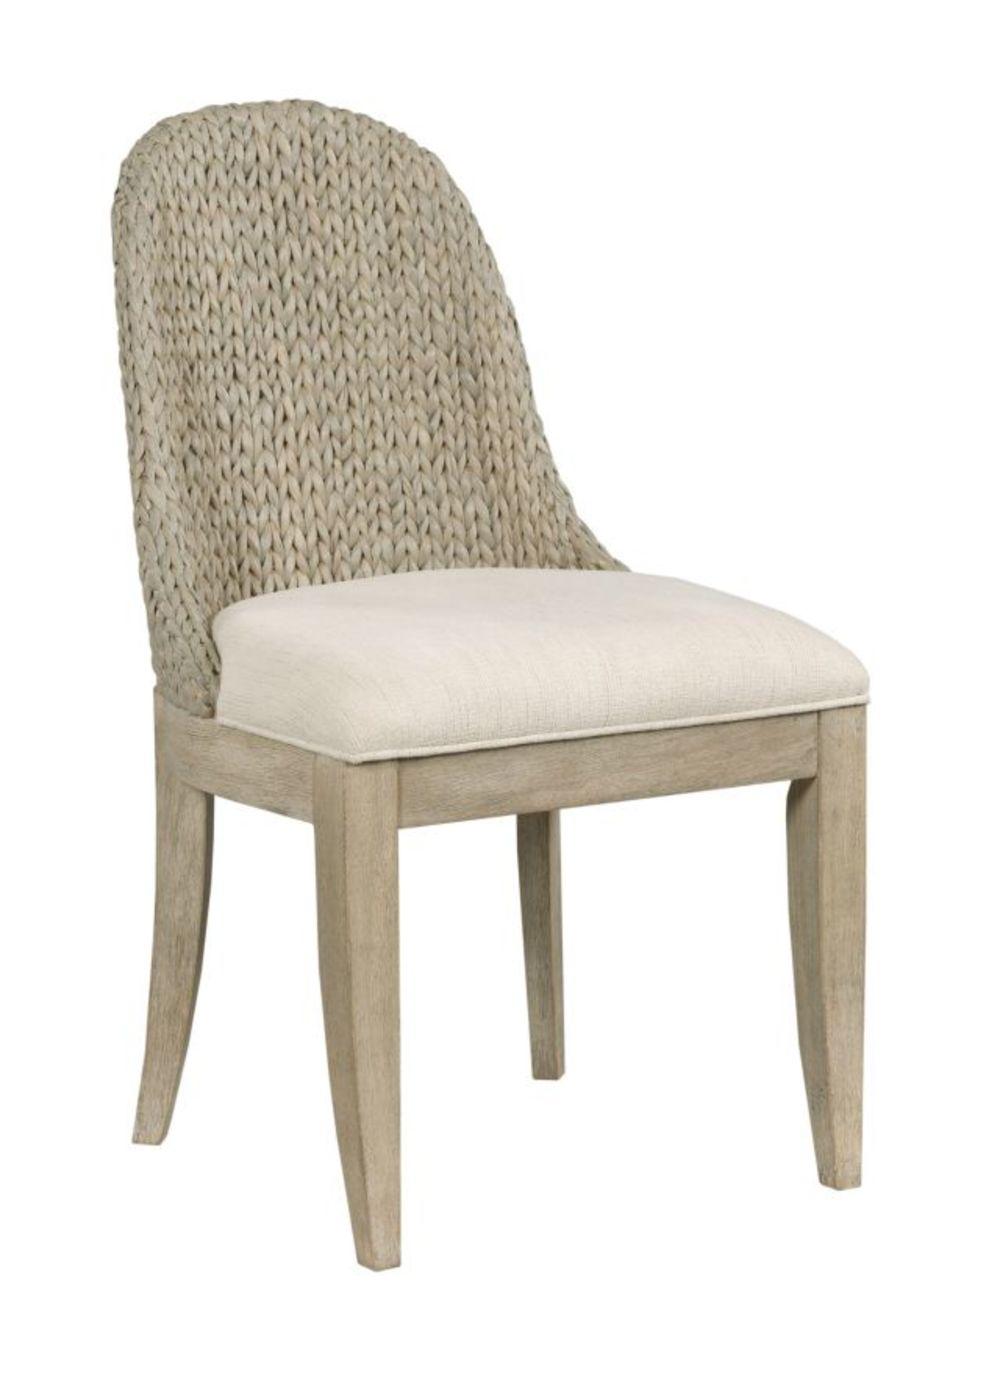 American Drew - Boca Woven Chair